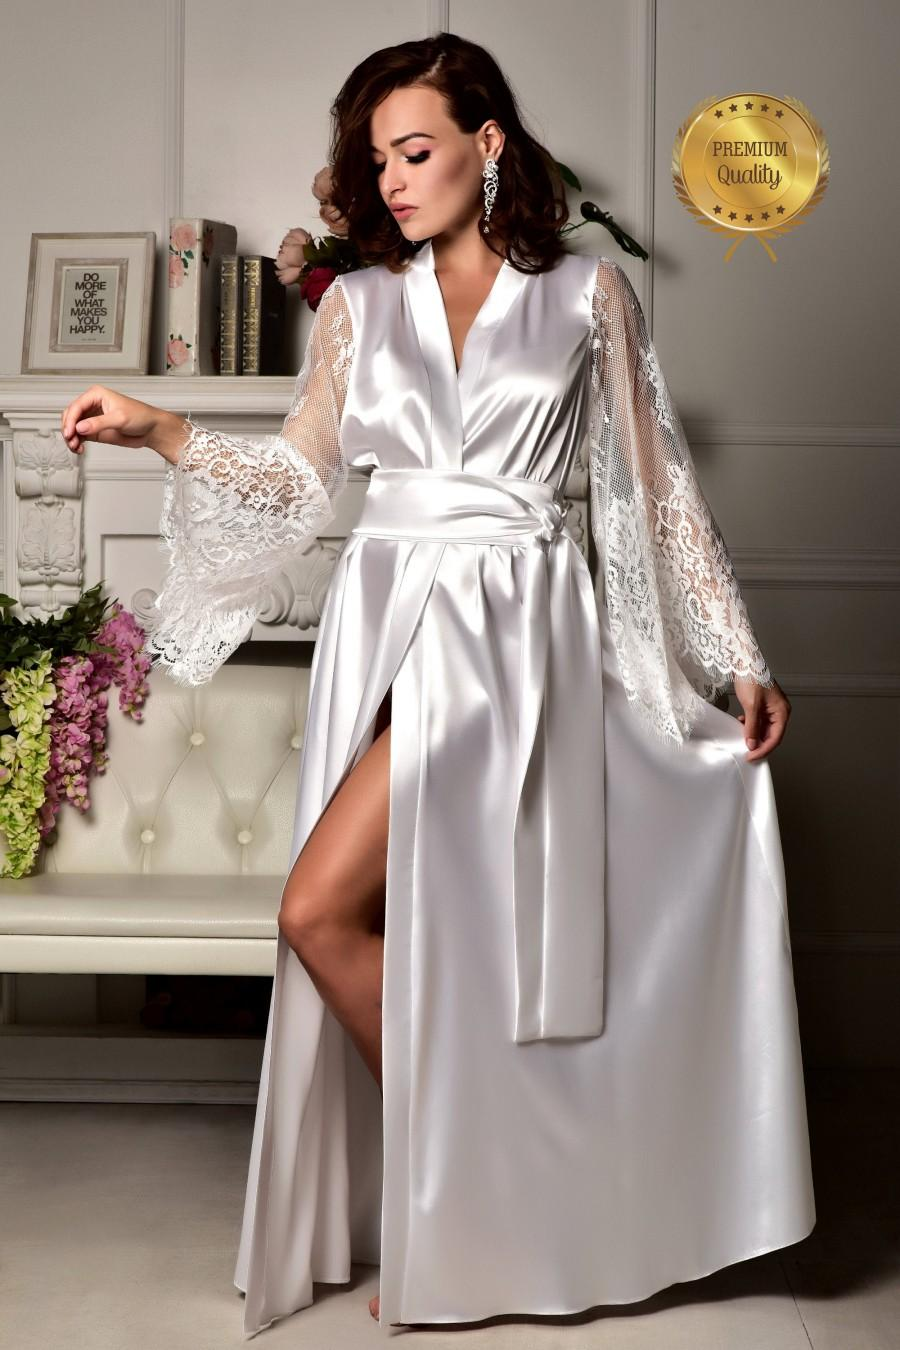 Hochzeit - Long bridal robe Long white robe wedding kimono Long lace bridal robe Kimono robe maxi robe Bride robe Bridal kimono Bridal dressing gown